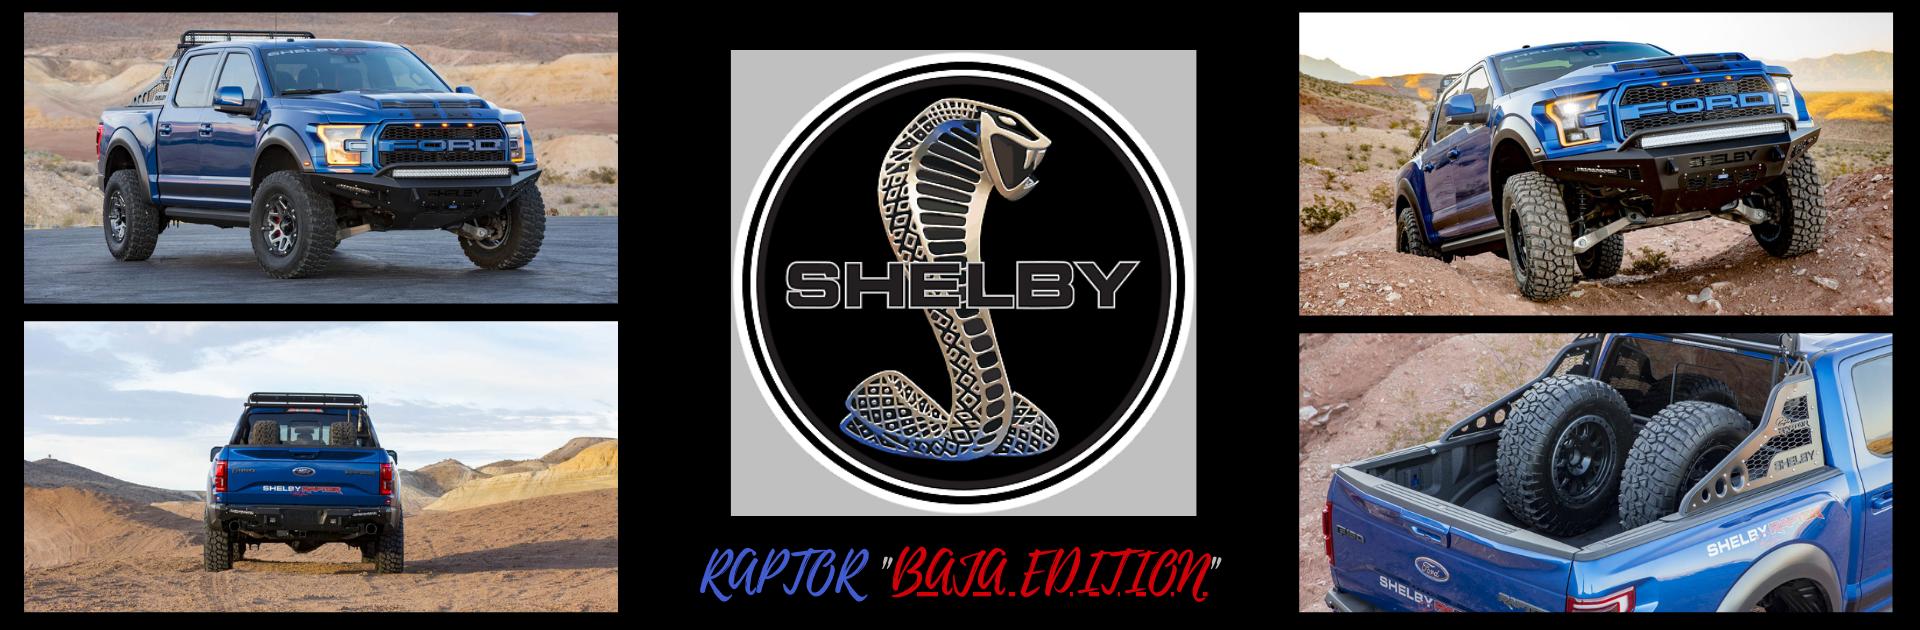 2020 Shelby Raptor Baja Edition